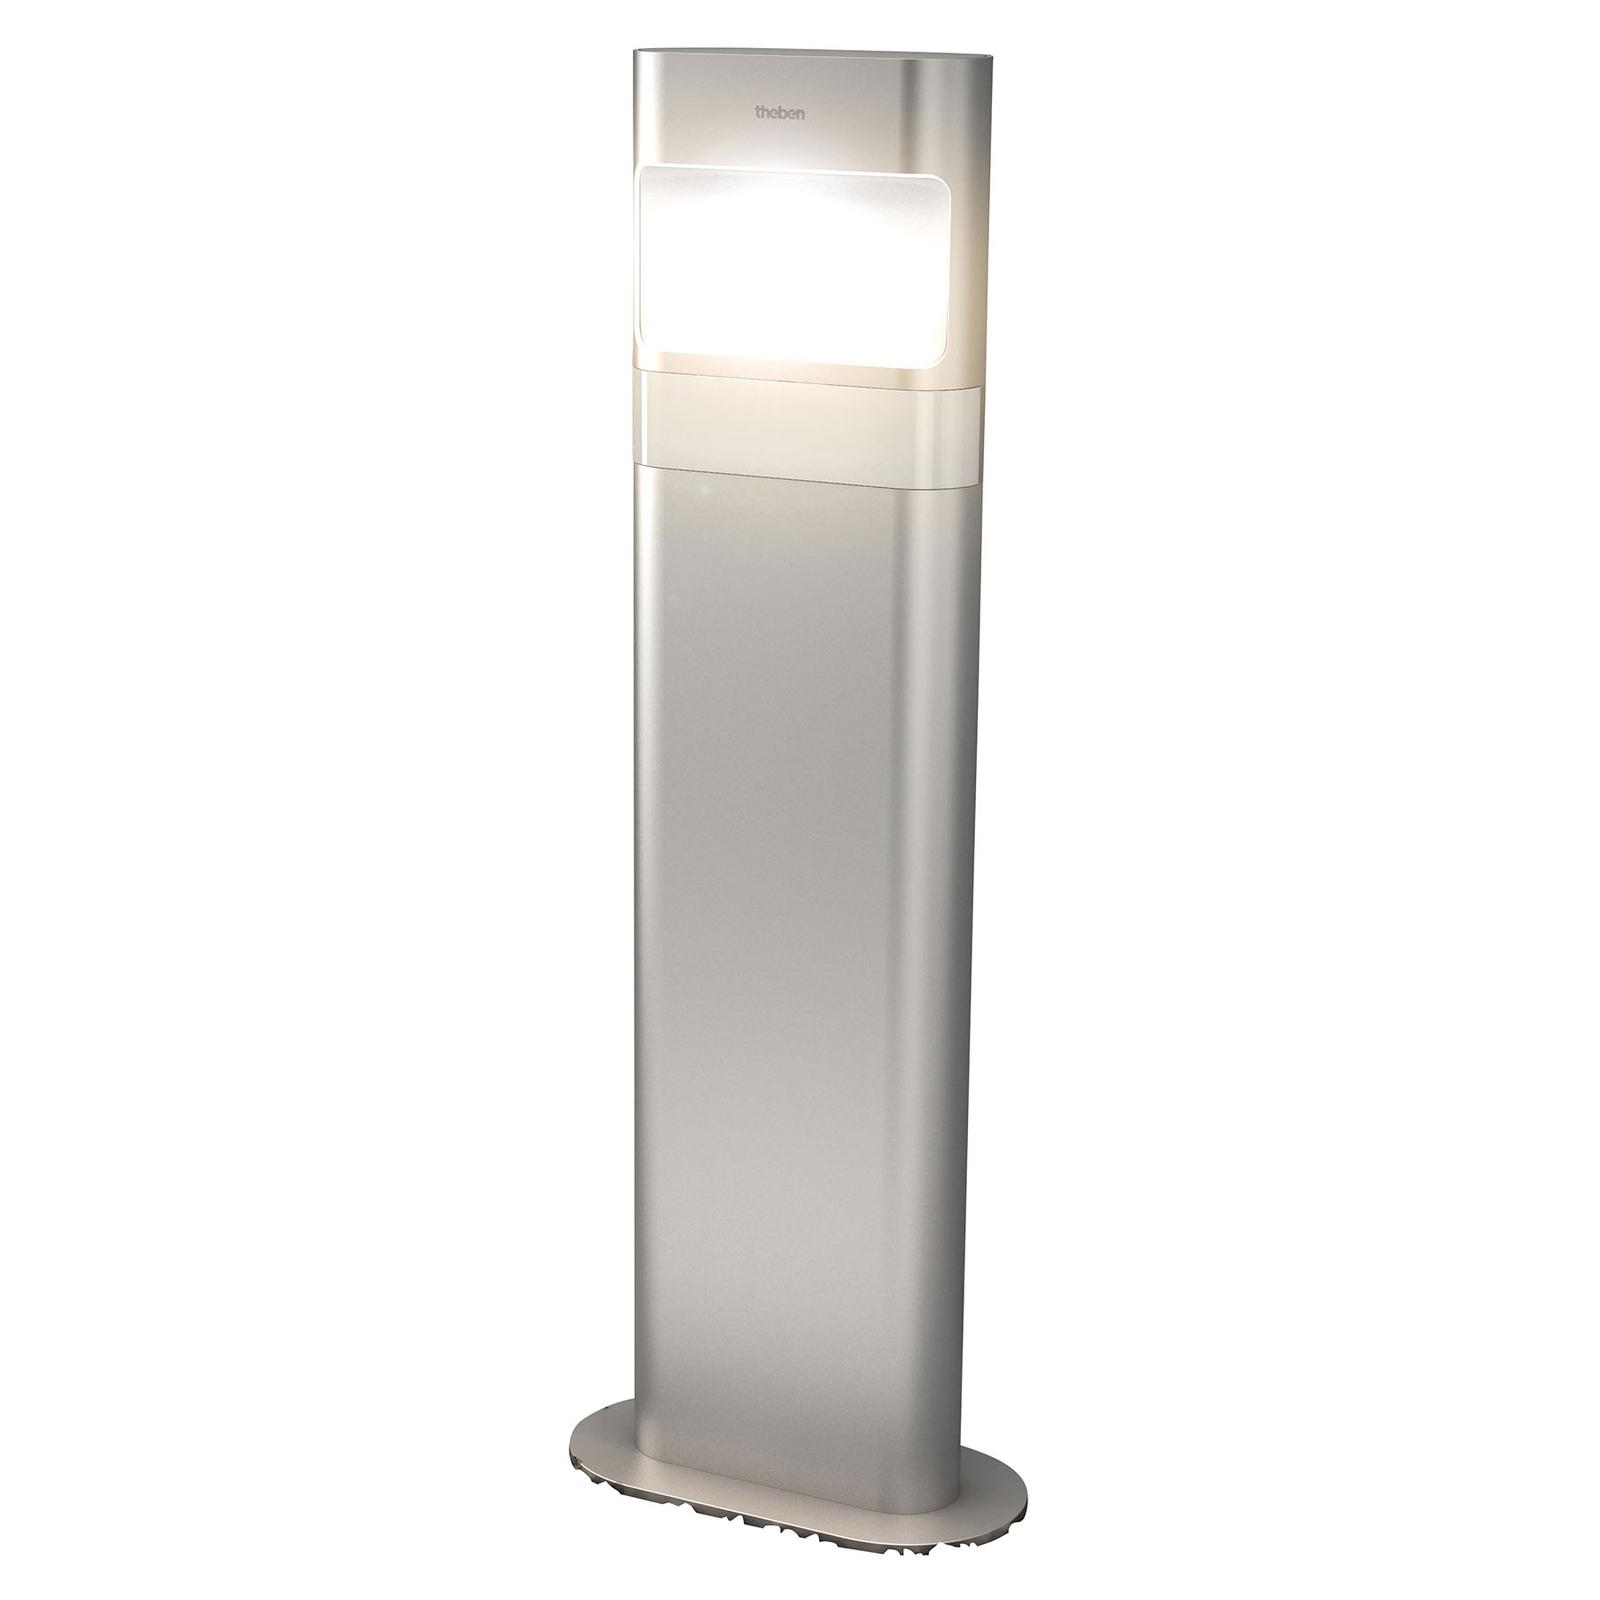 Theben theLeda D BL plus AL Sensor-Wegelampe 72 cm